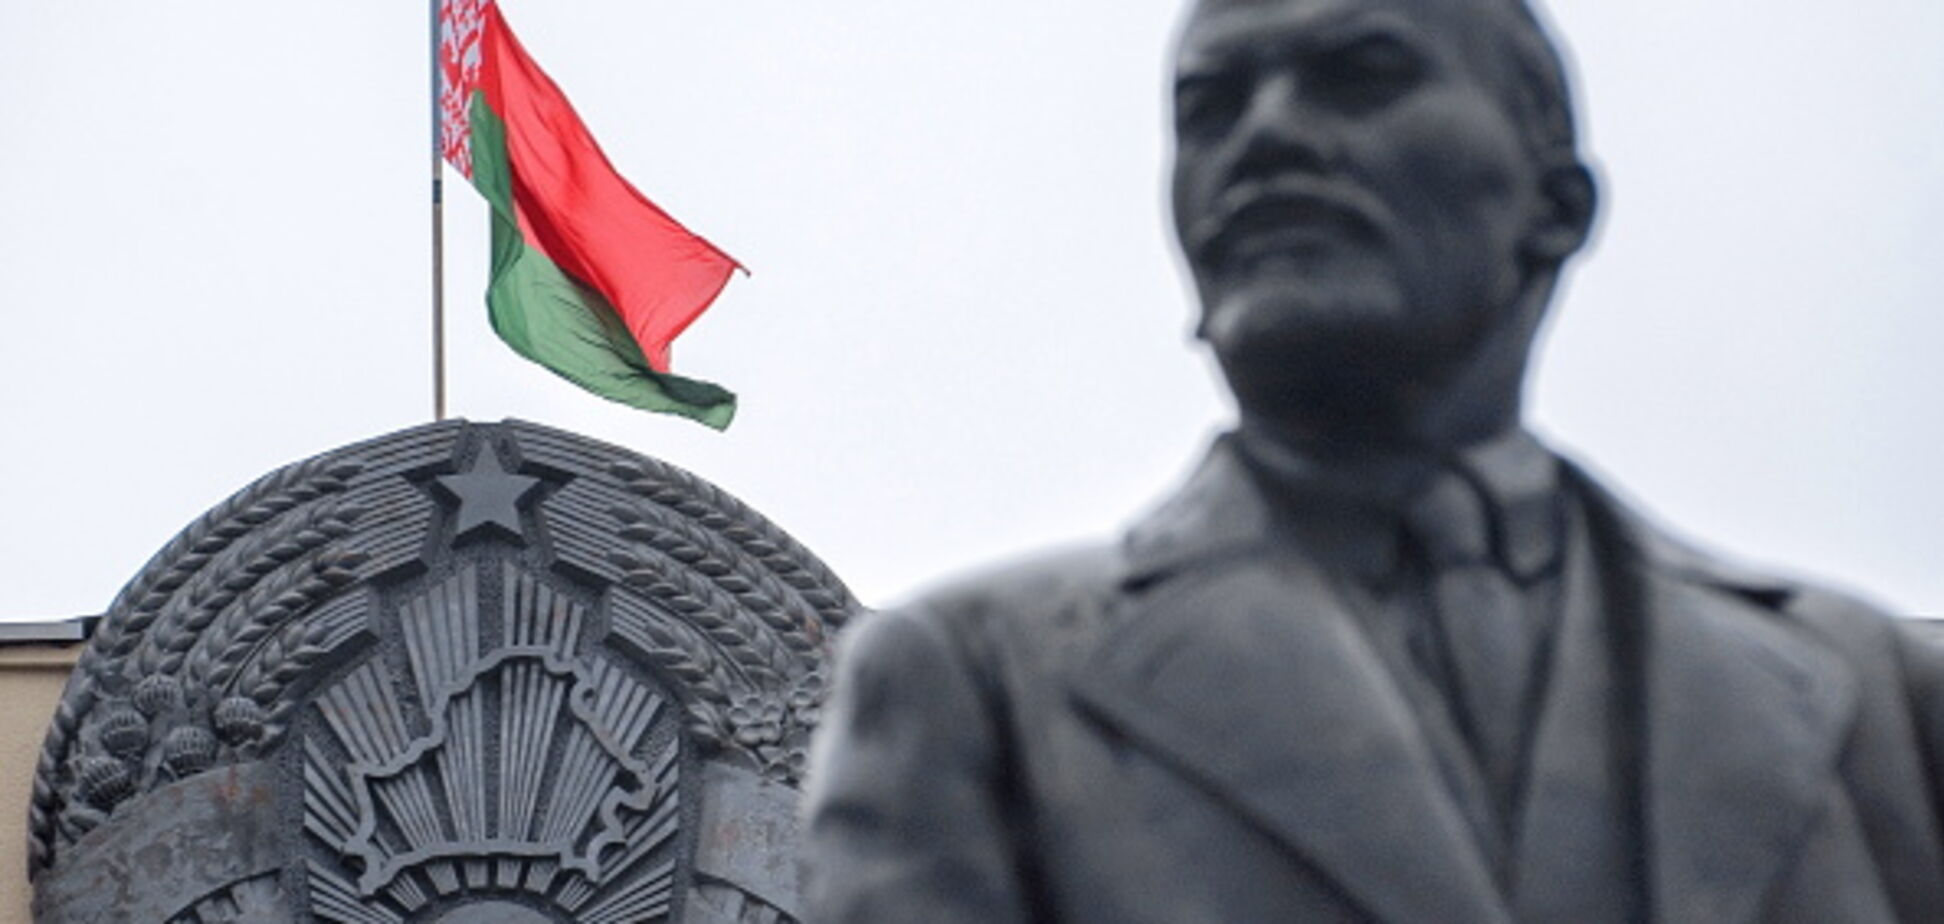 Еще один 'шпион': Беларусь объявила украинского дипломата персоной нон грата